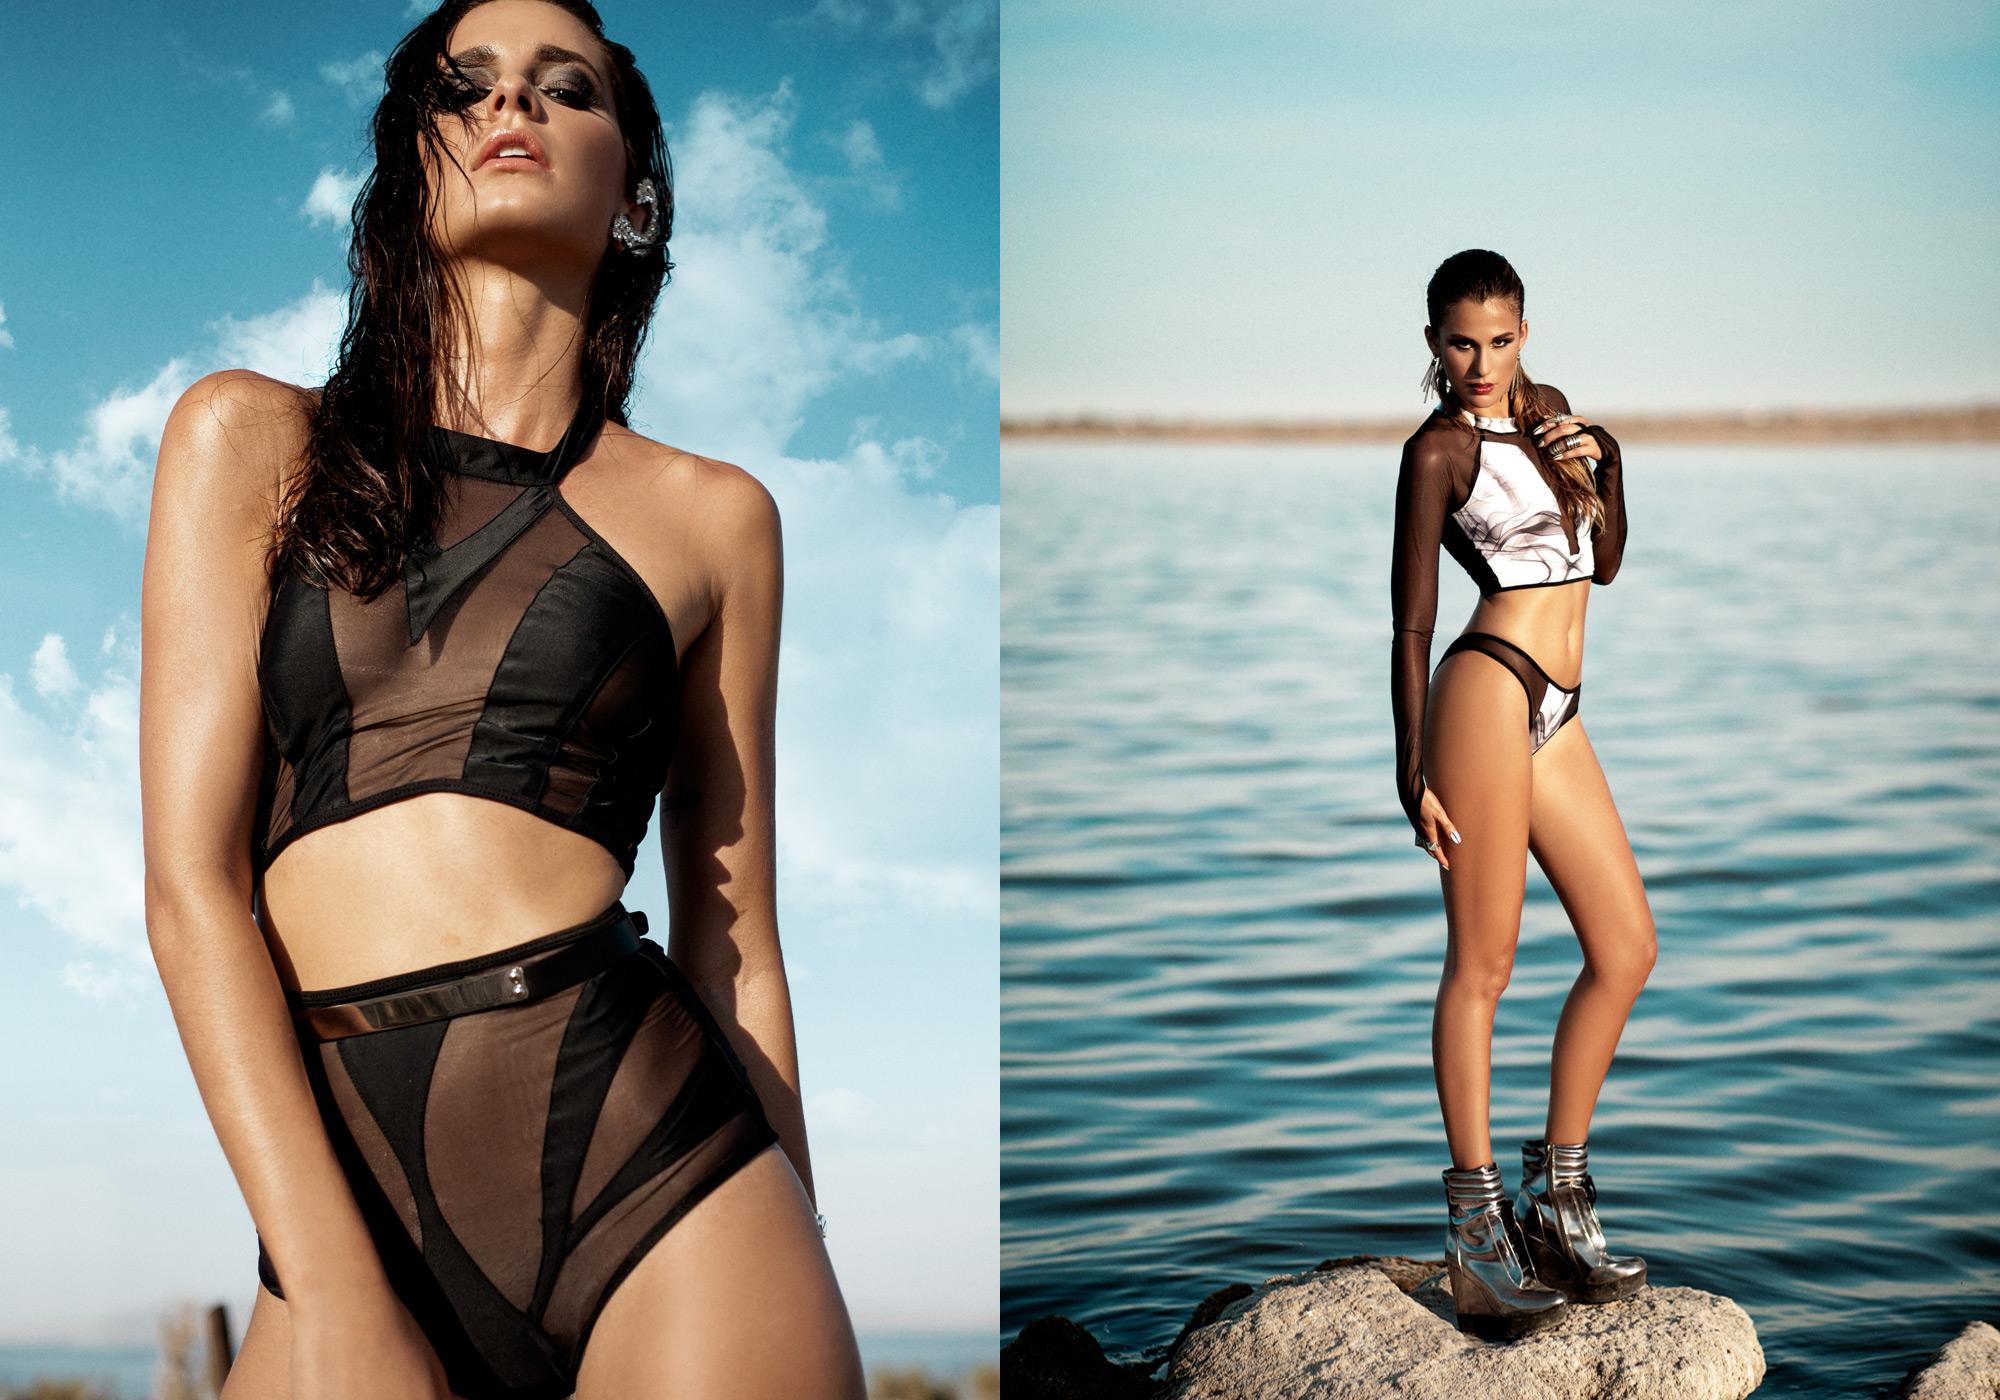 karlaticas_swim+body24.jpg